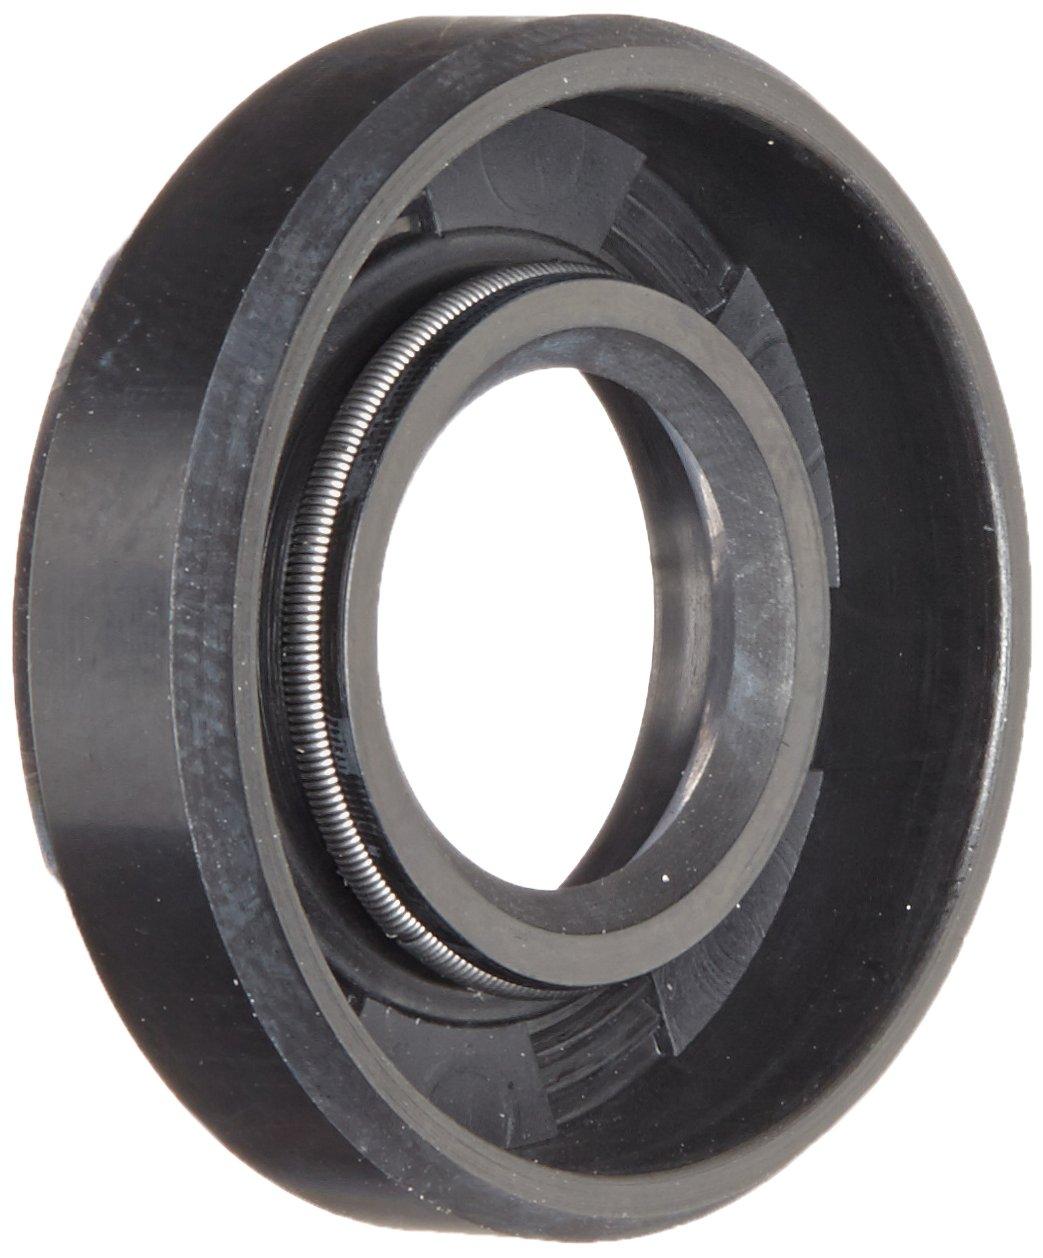 R Lip Code 7mm Width 13mm Shaft Diameter SKF 5254 LDS /& Small Bore Seal Metric 28mm Bore Diameter HMS4 Style